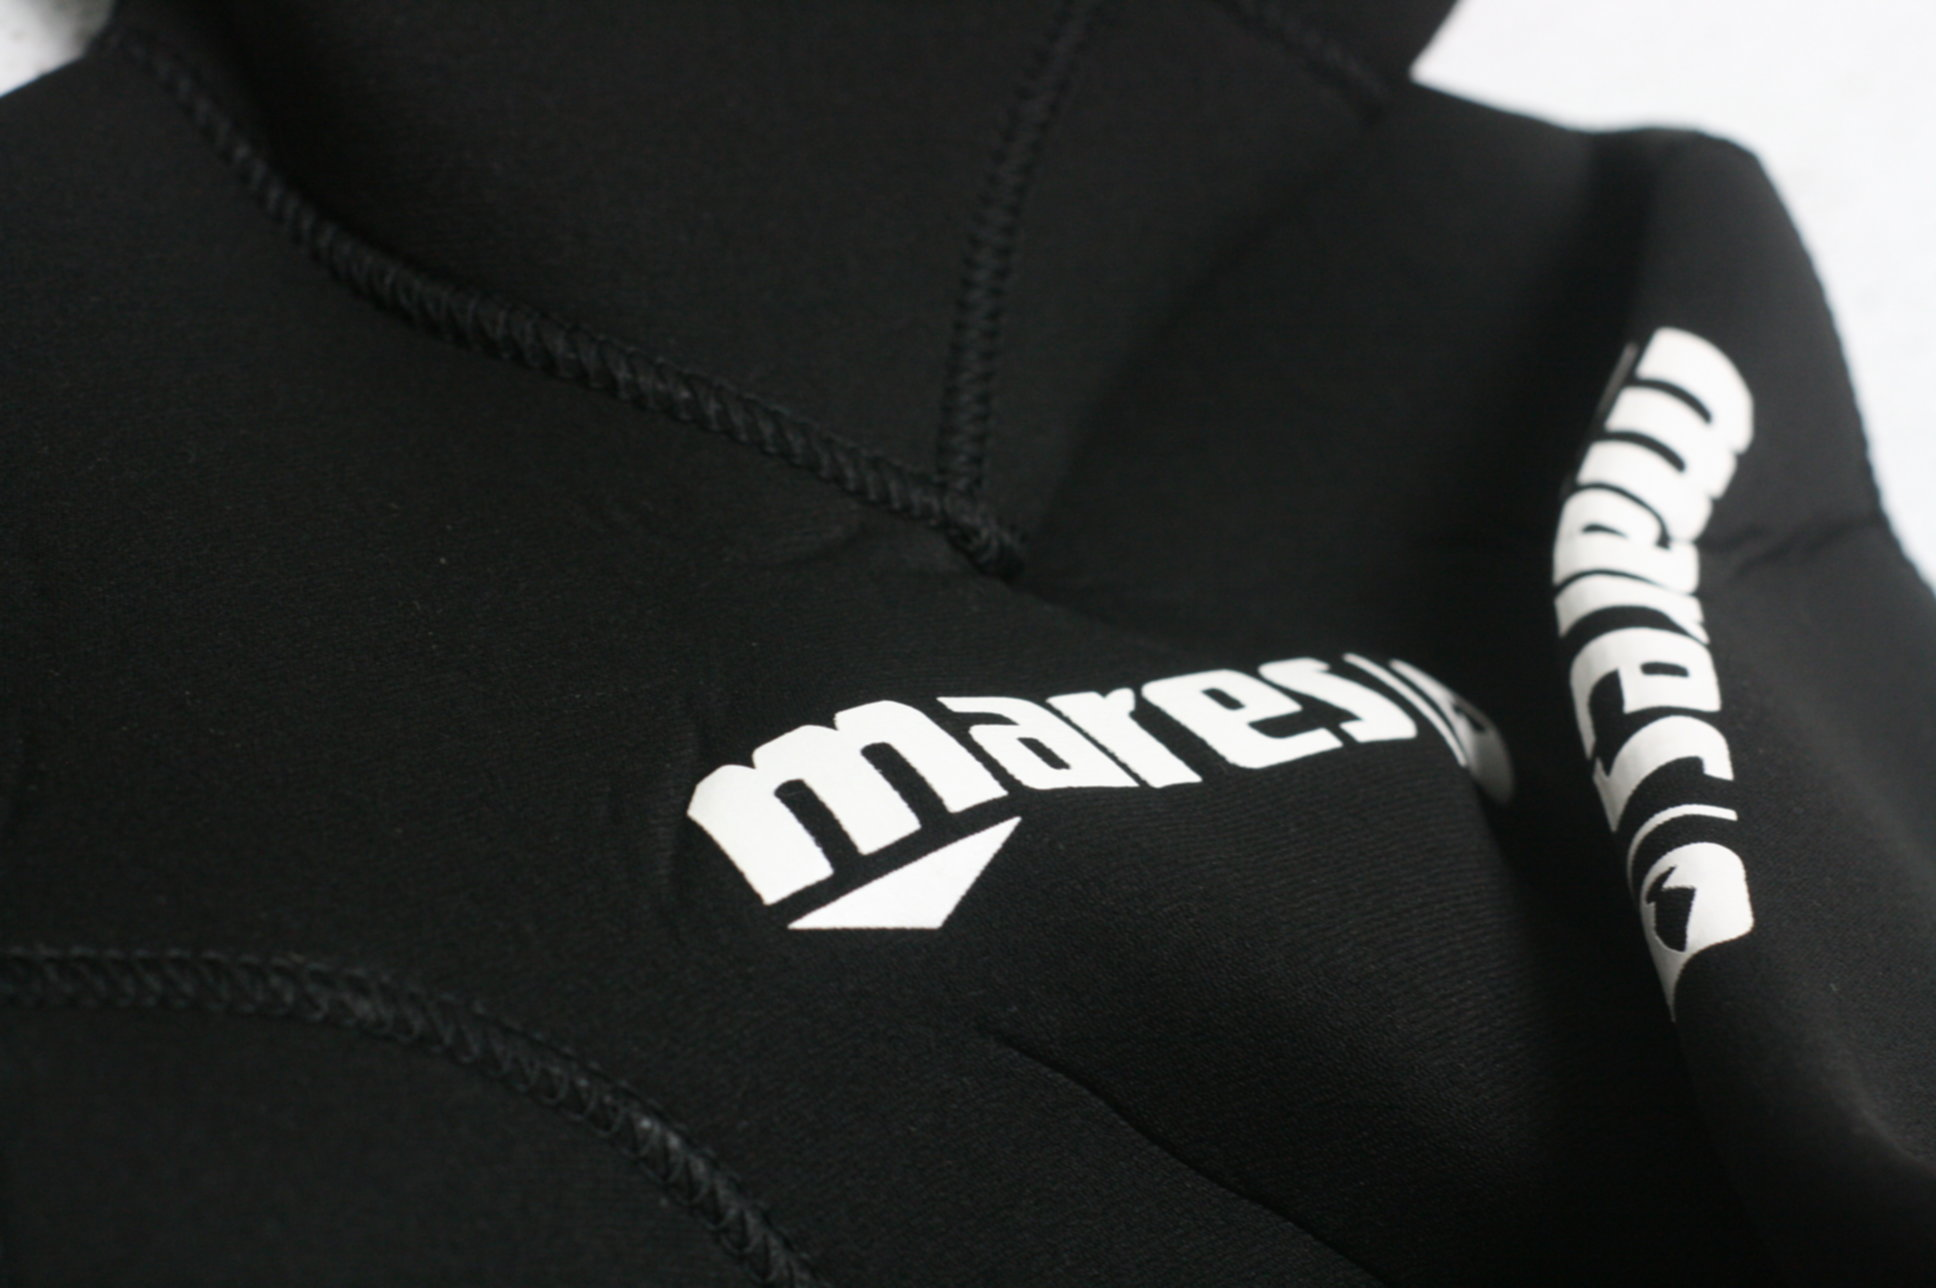 Mares Womens 5mm Apnea Instinct 50 Wetsuit Jacket Medium Black High ... b9e386bcb